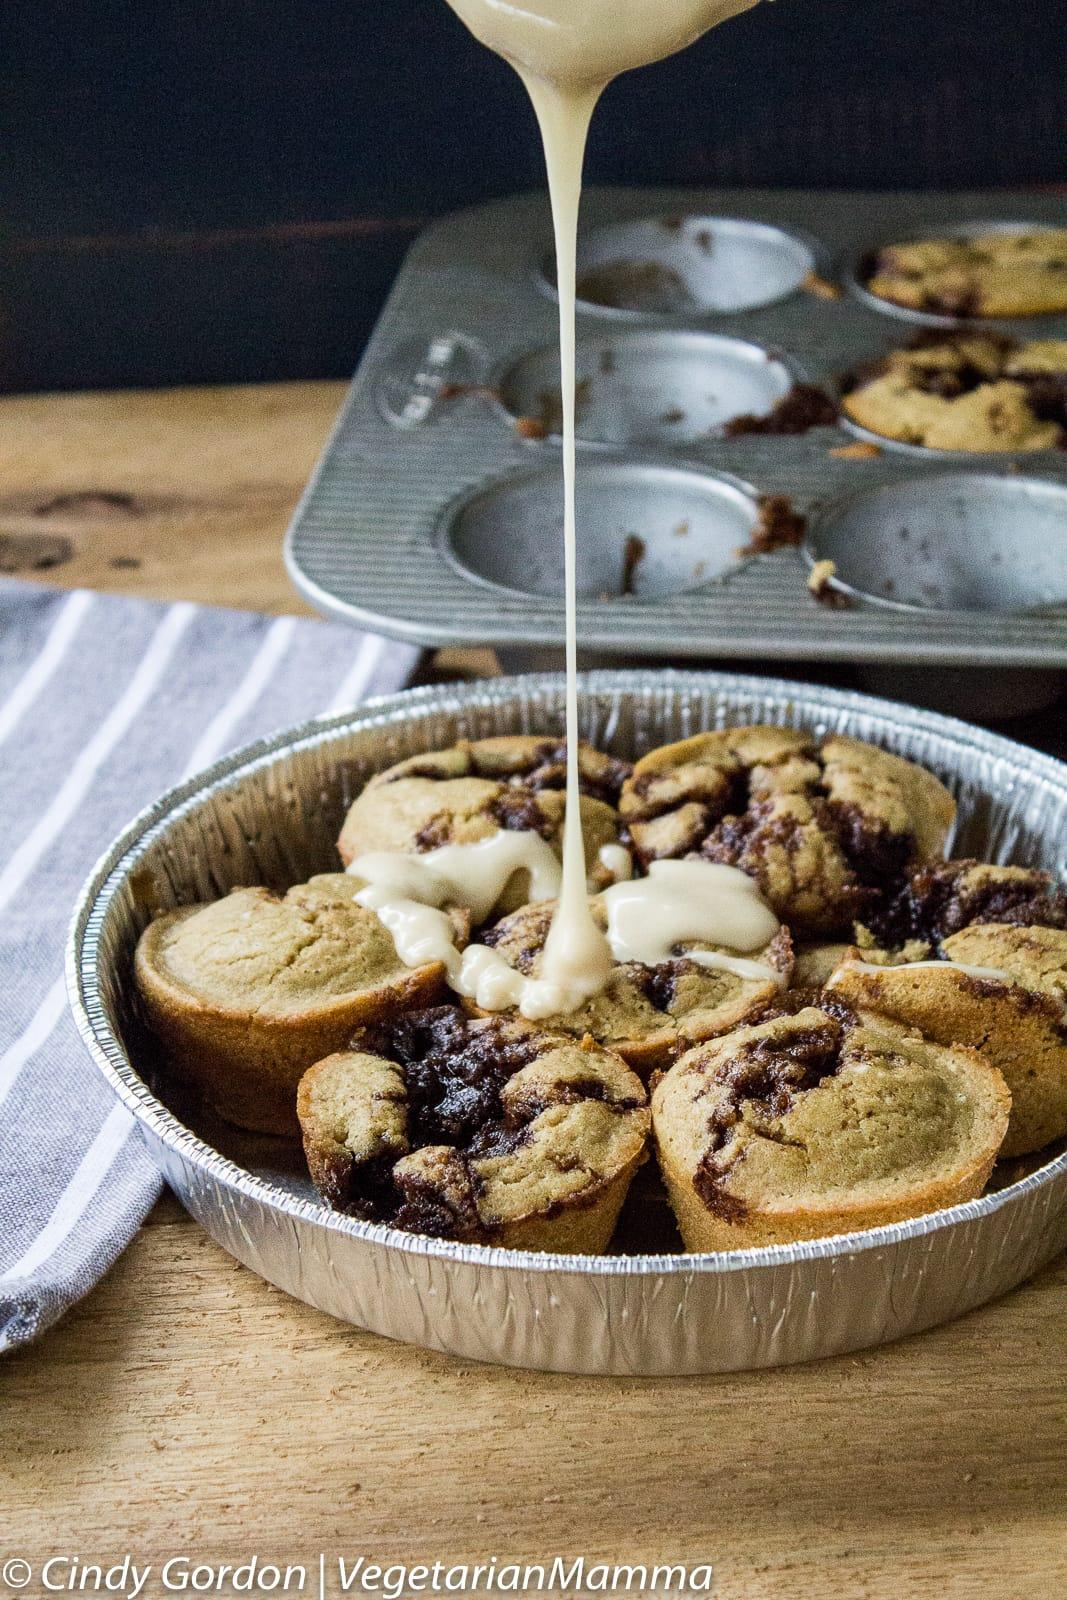 Gluten Free and Allergy Friendly Cinnamon Roll Muffins